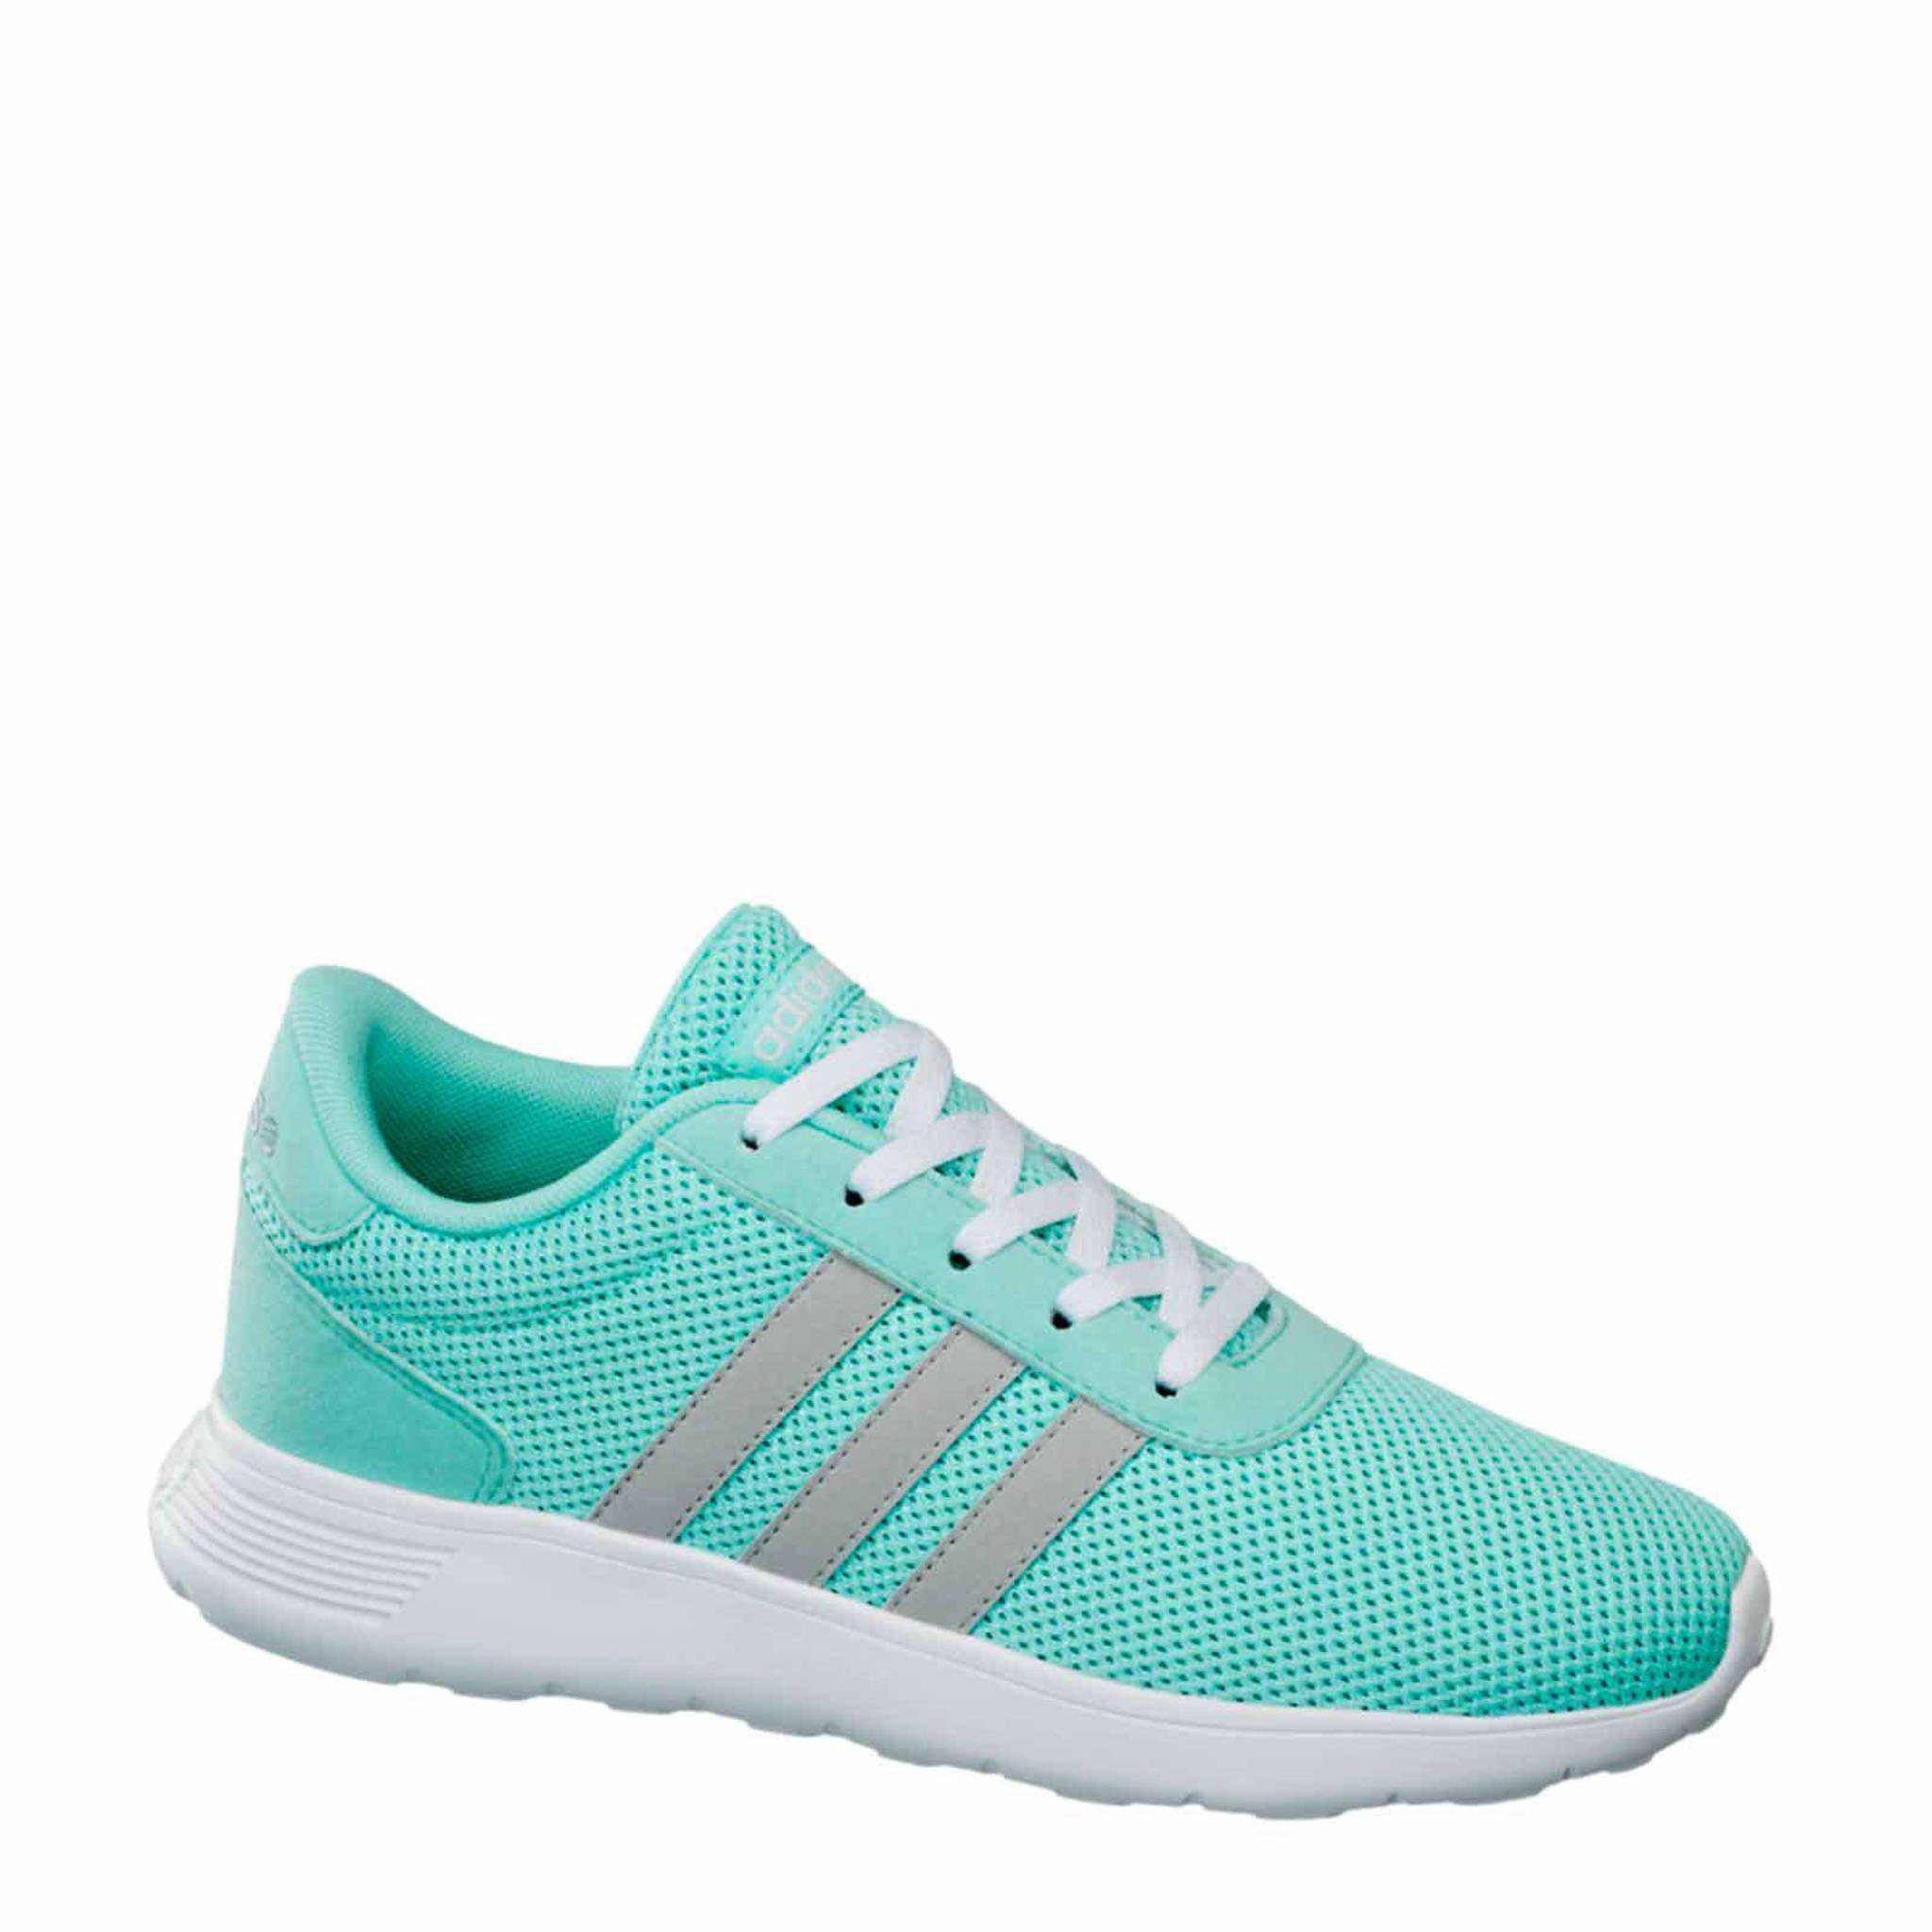 e63c08ad6e5 adidas neo sneakers meisjes | wehkamp